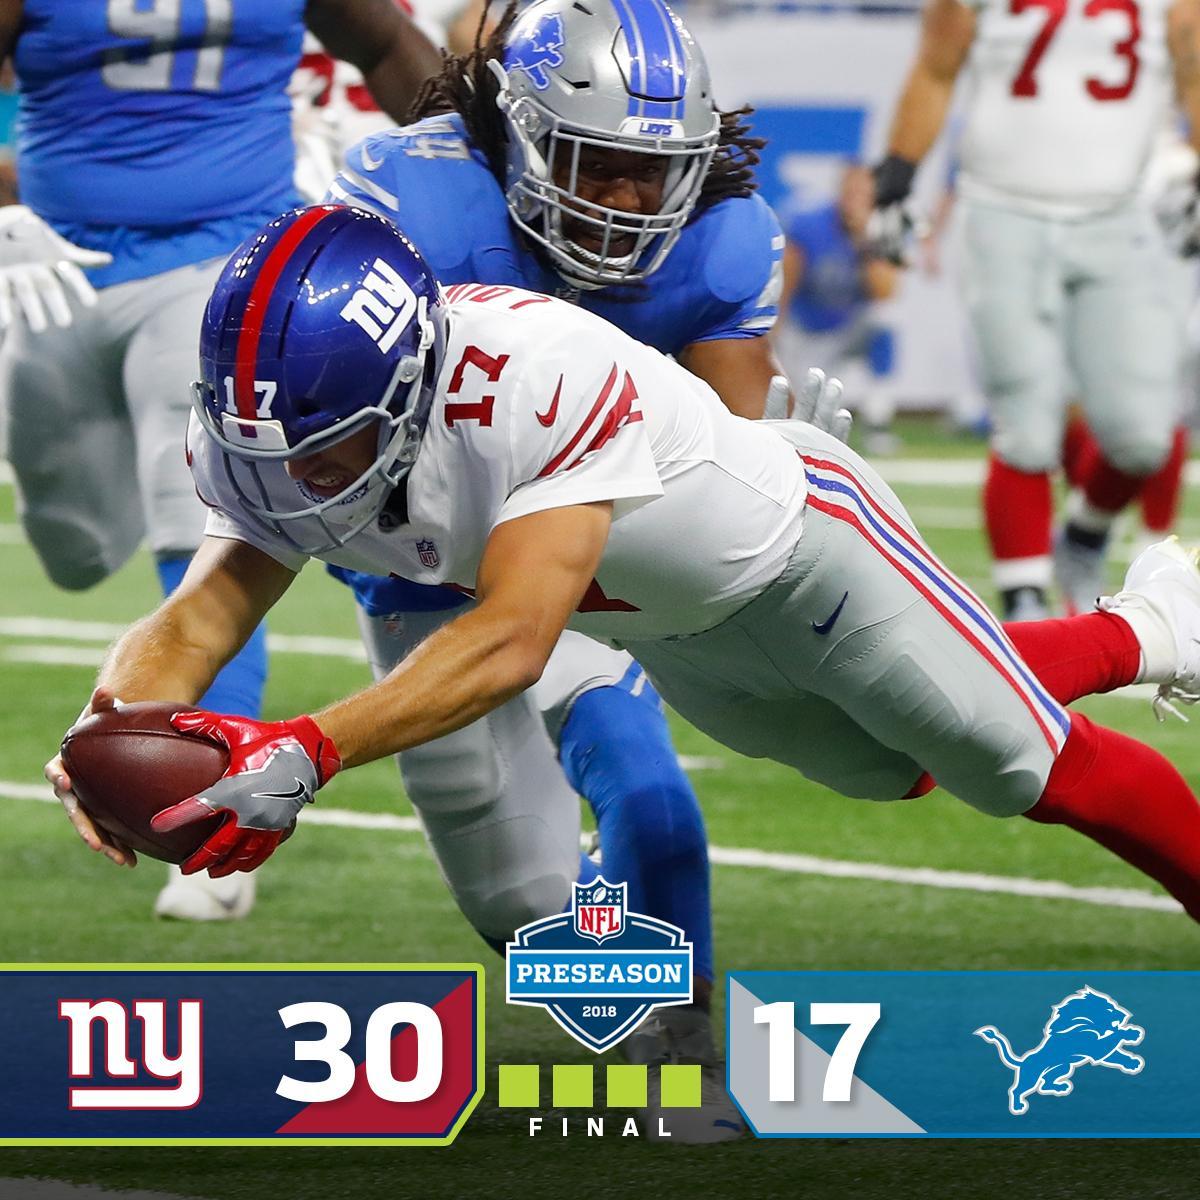 FINAL: @Giants get the preseason WIN! #NYGvsDET https://t.co/zF2SFgrC9p